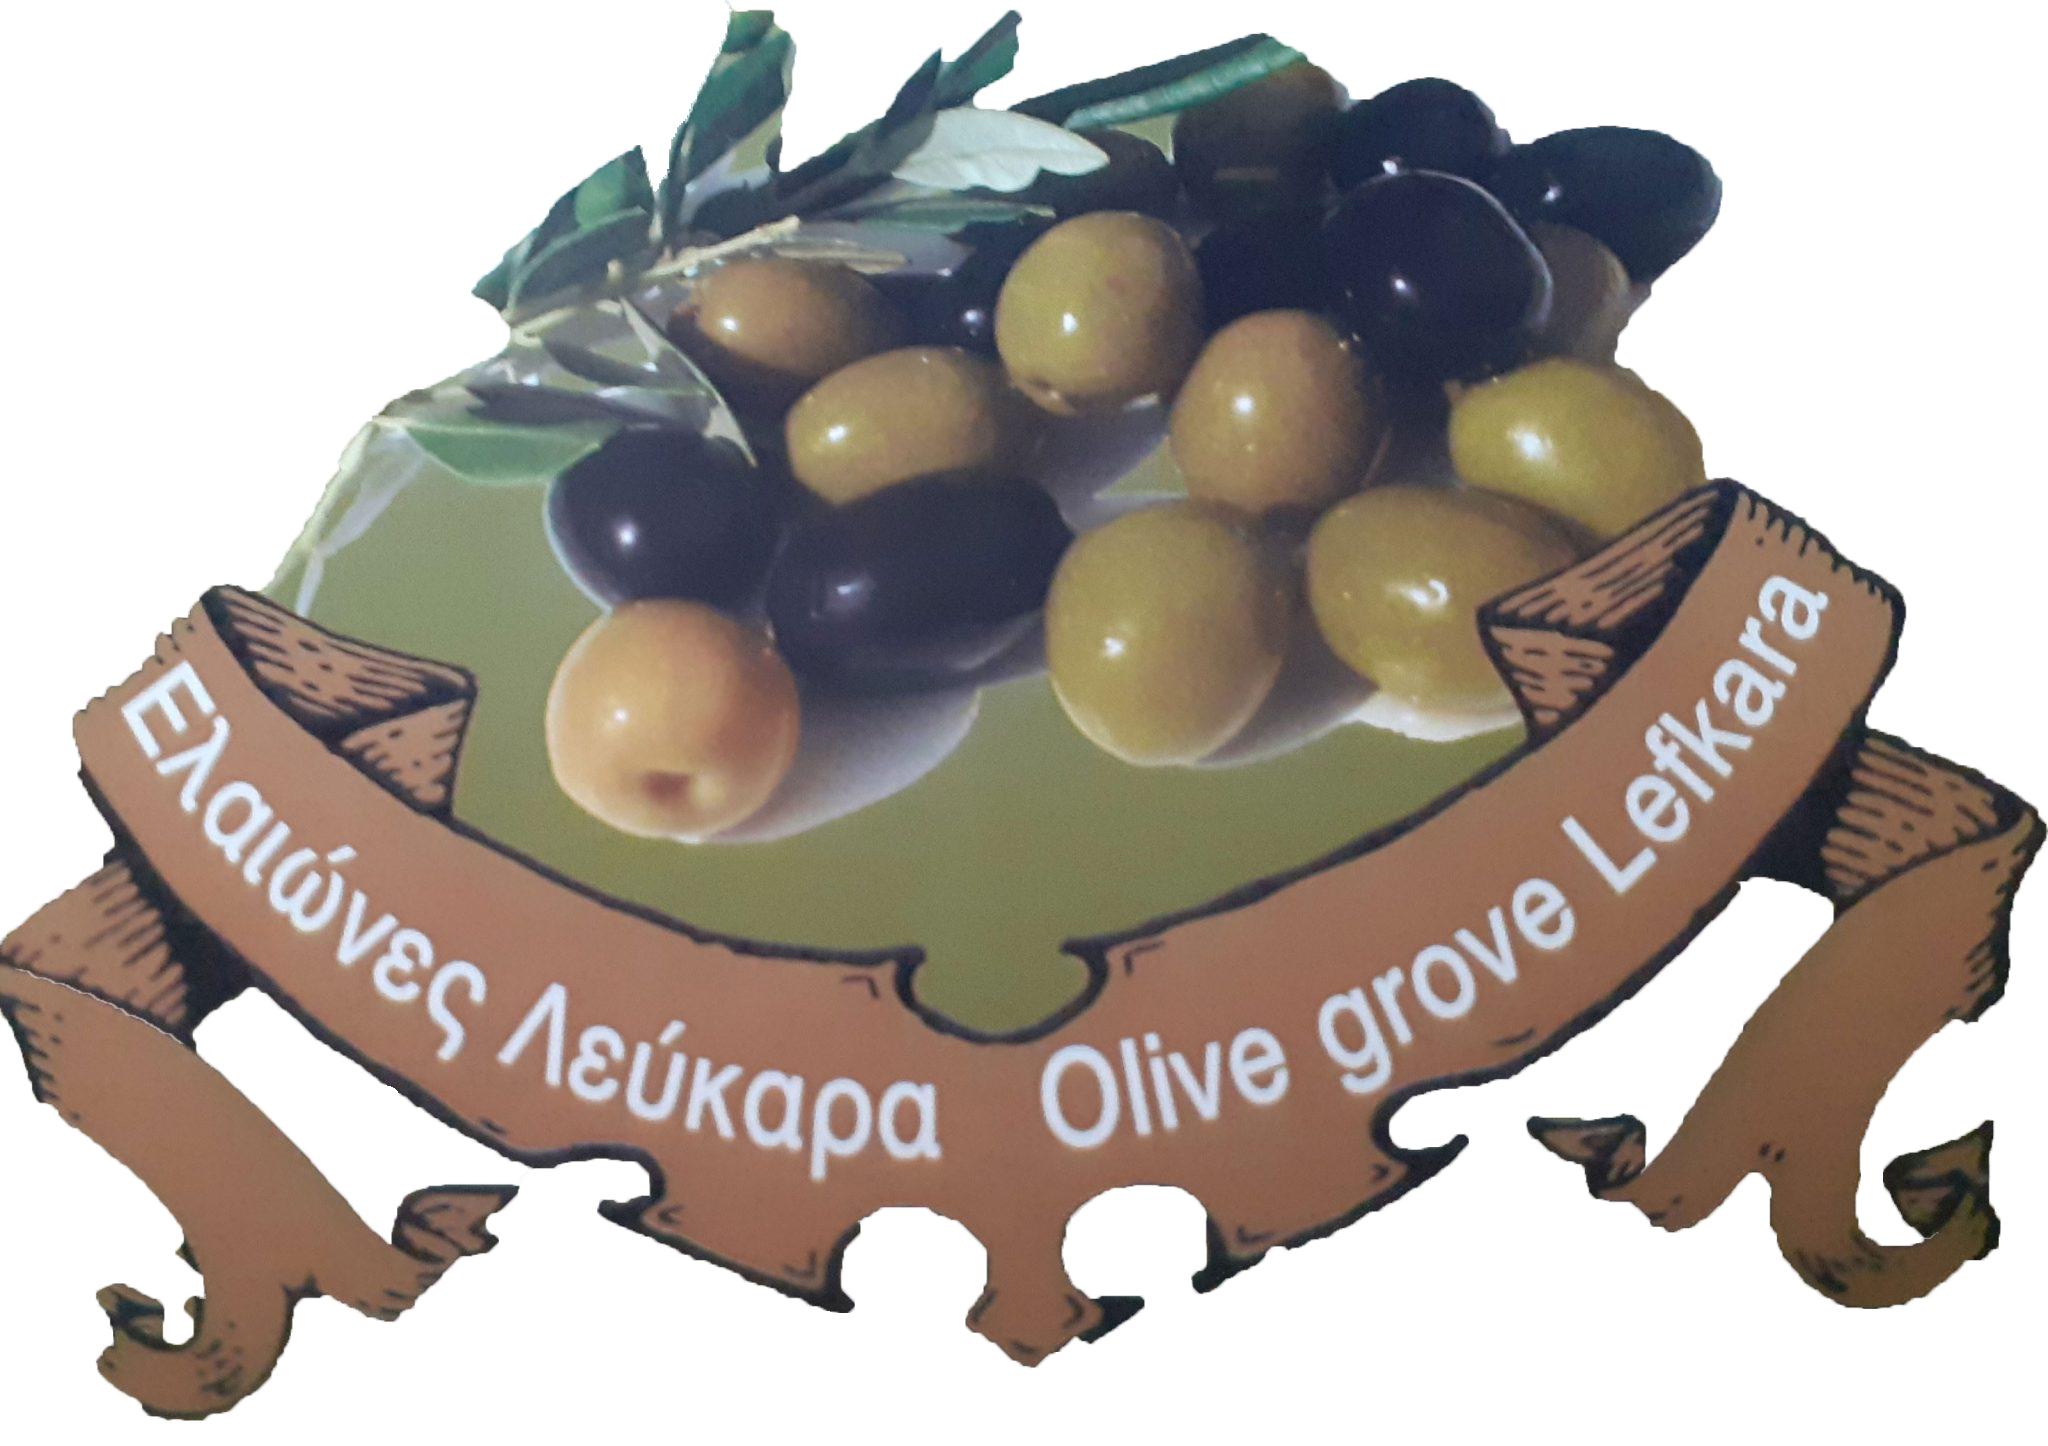 Olive Oil Yi